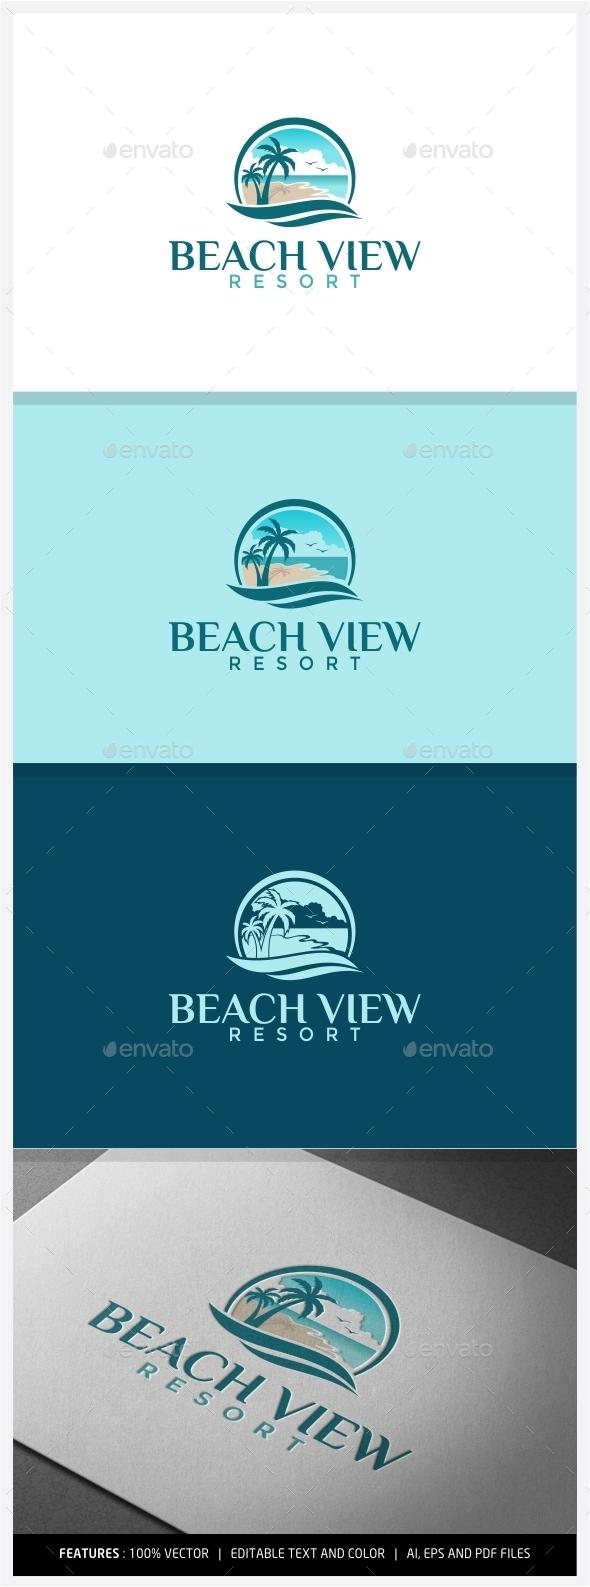 Beach View Resort Logo - Nature Logo Templates